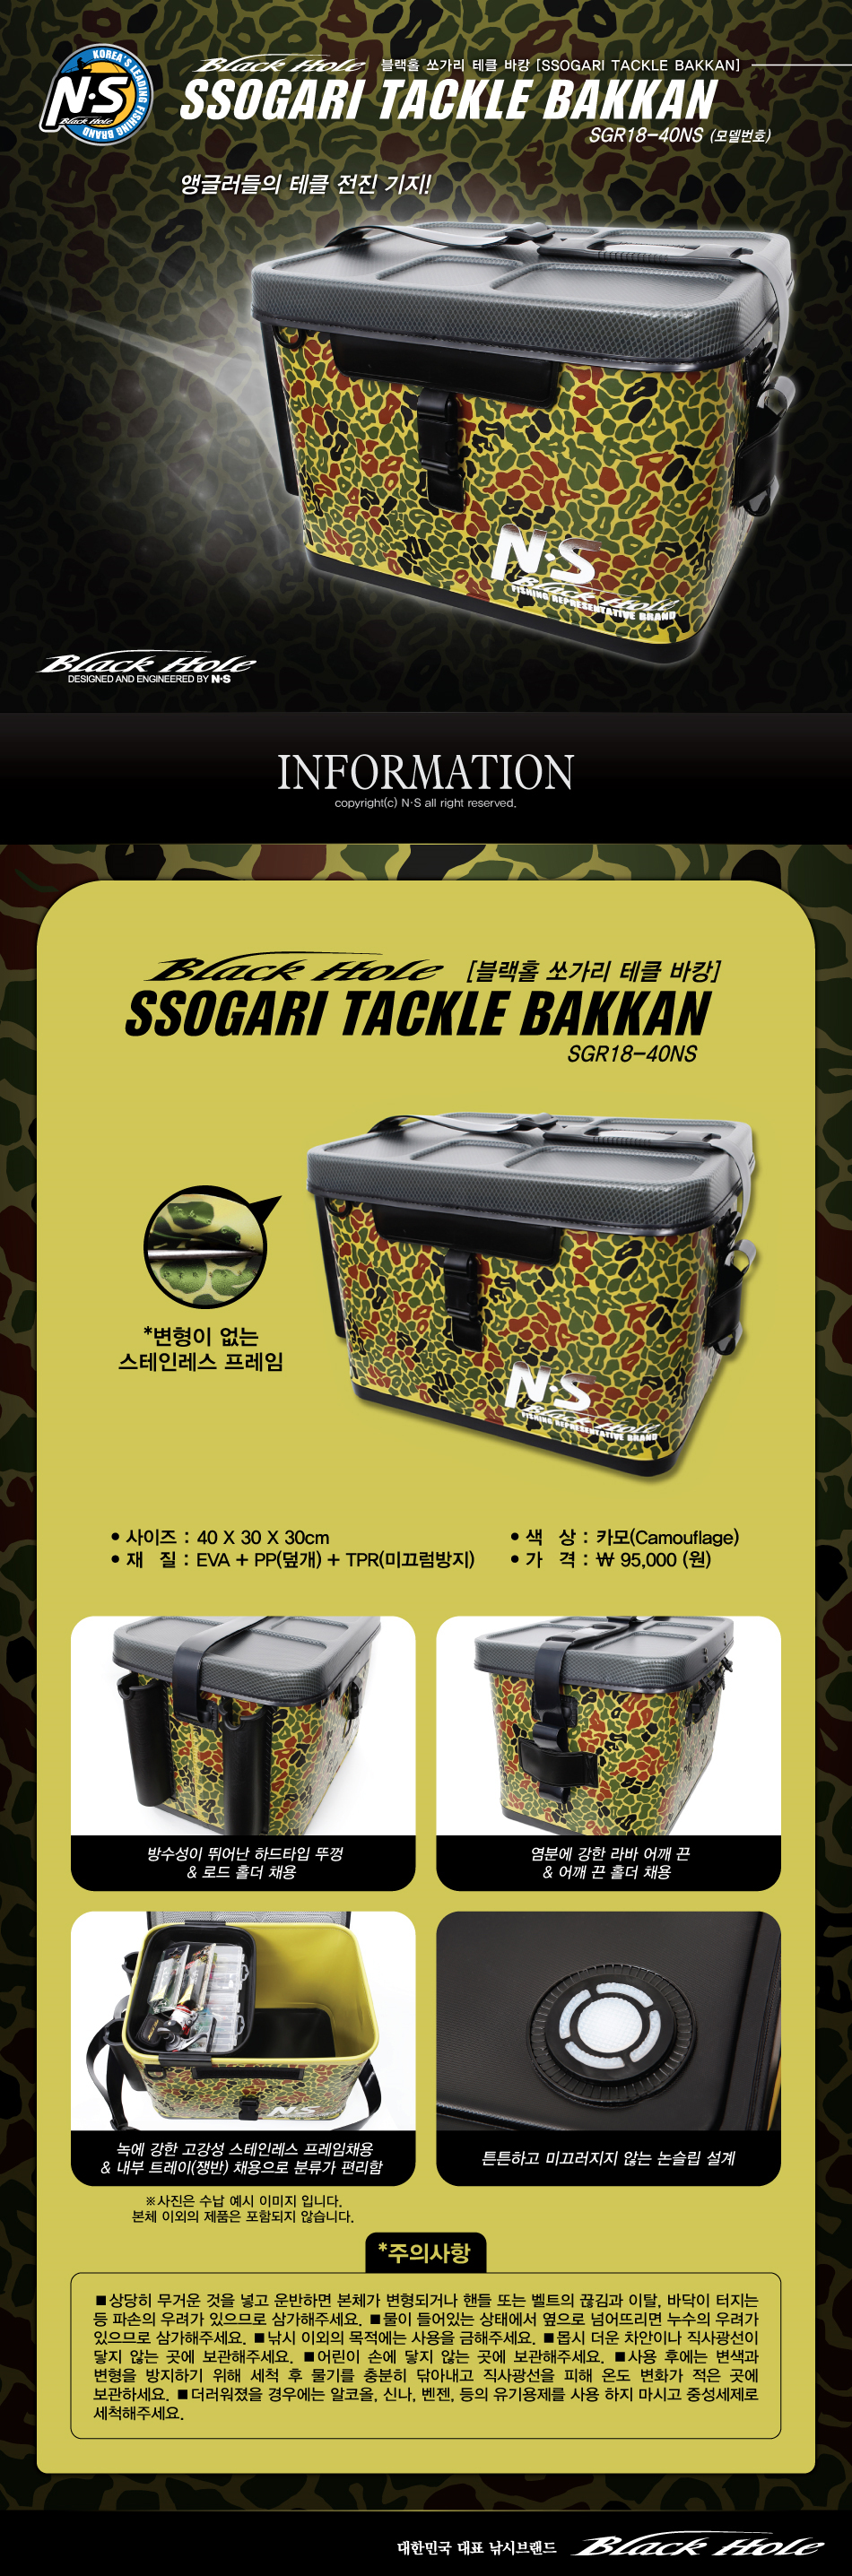 NS 블랙홀 쏘가리 테클 바캉 (SGR18-40NS) 바캉 살림통 쏘가리바캉 보조가방 루어용보조가방 루어가방 쏘가리